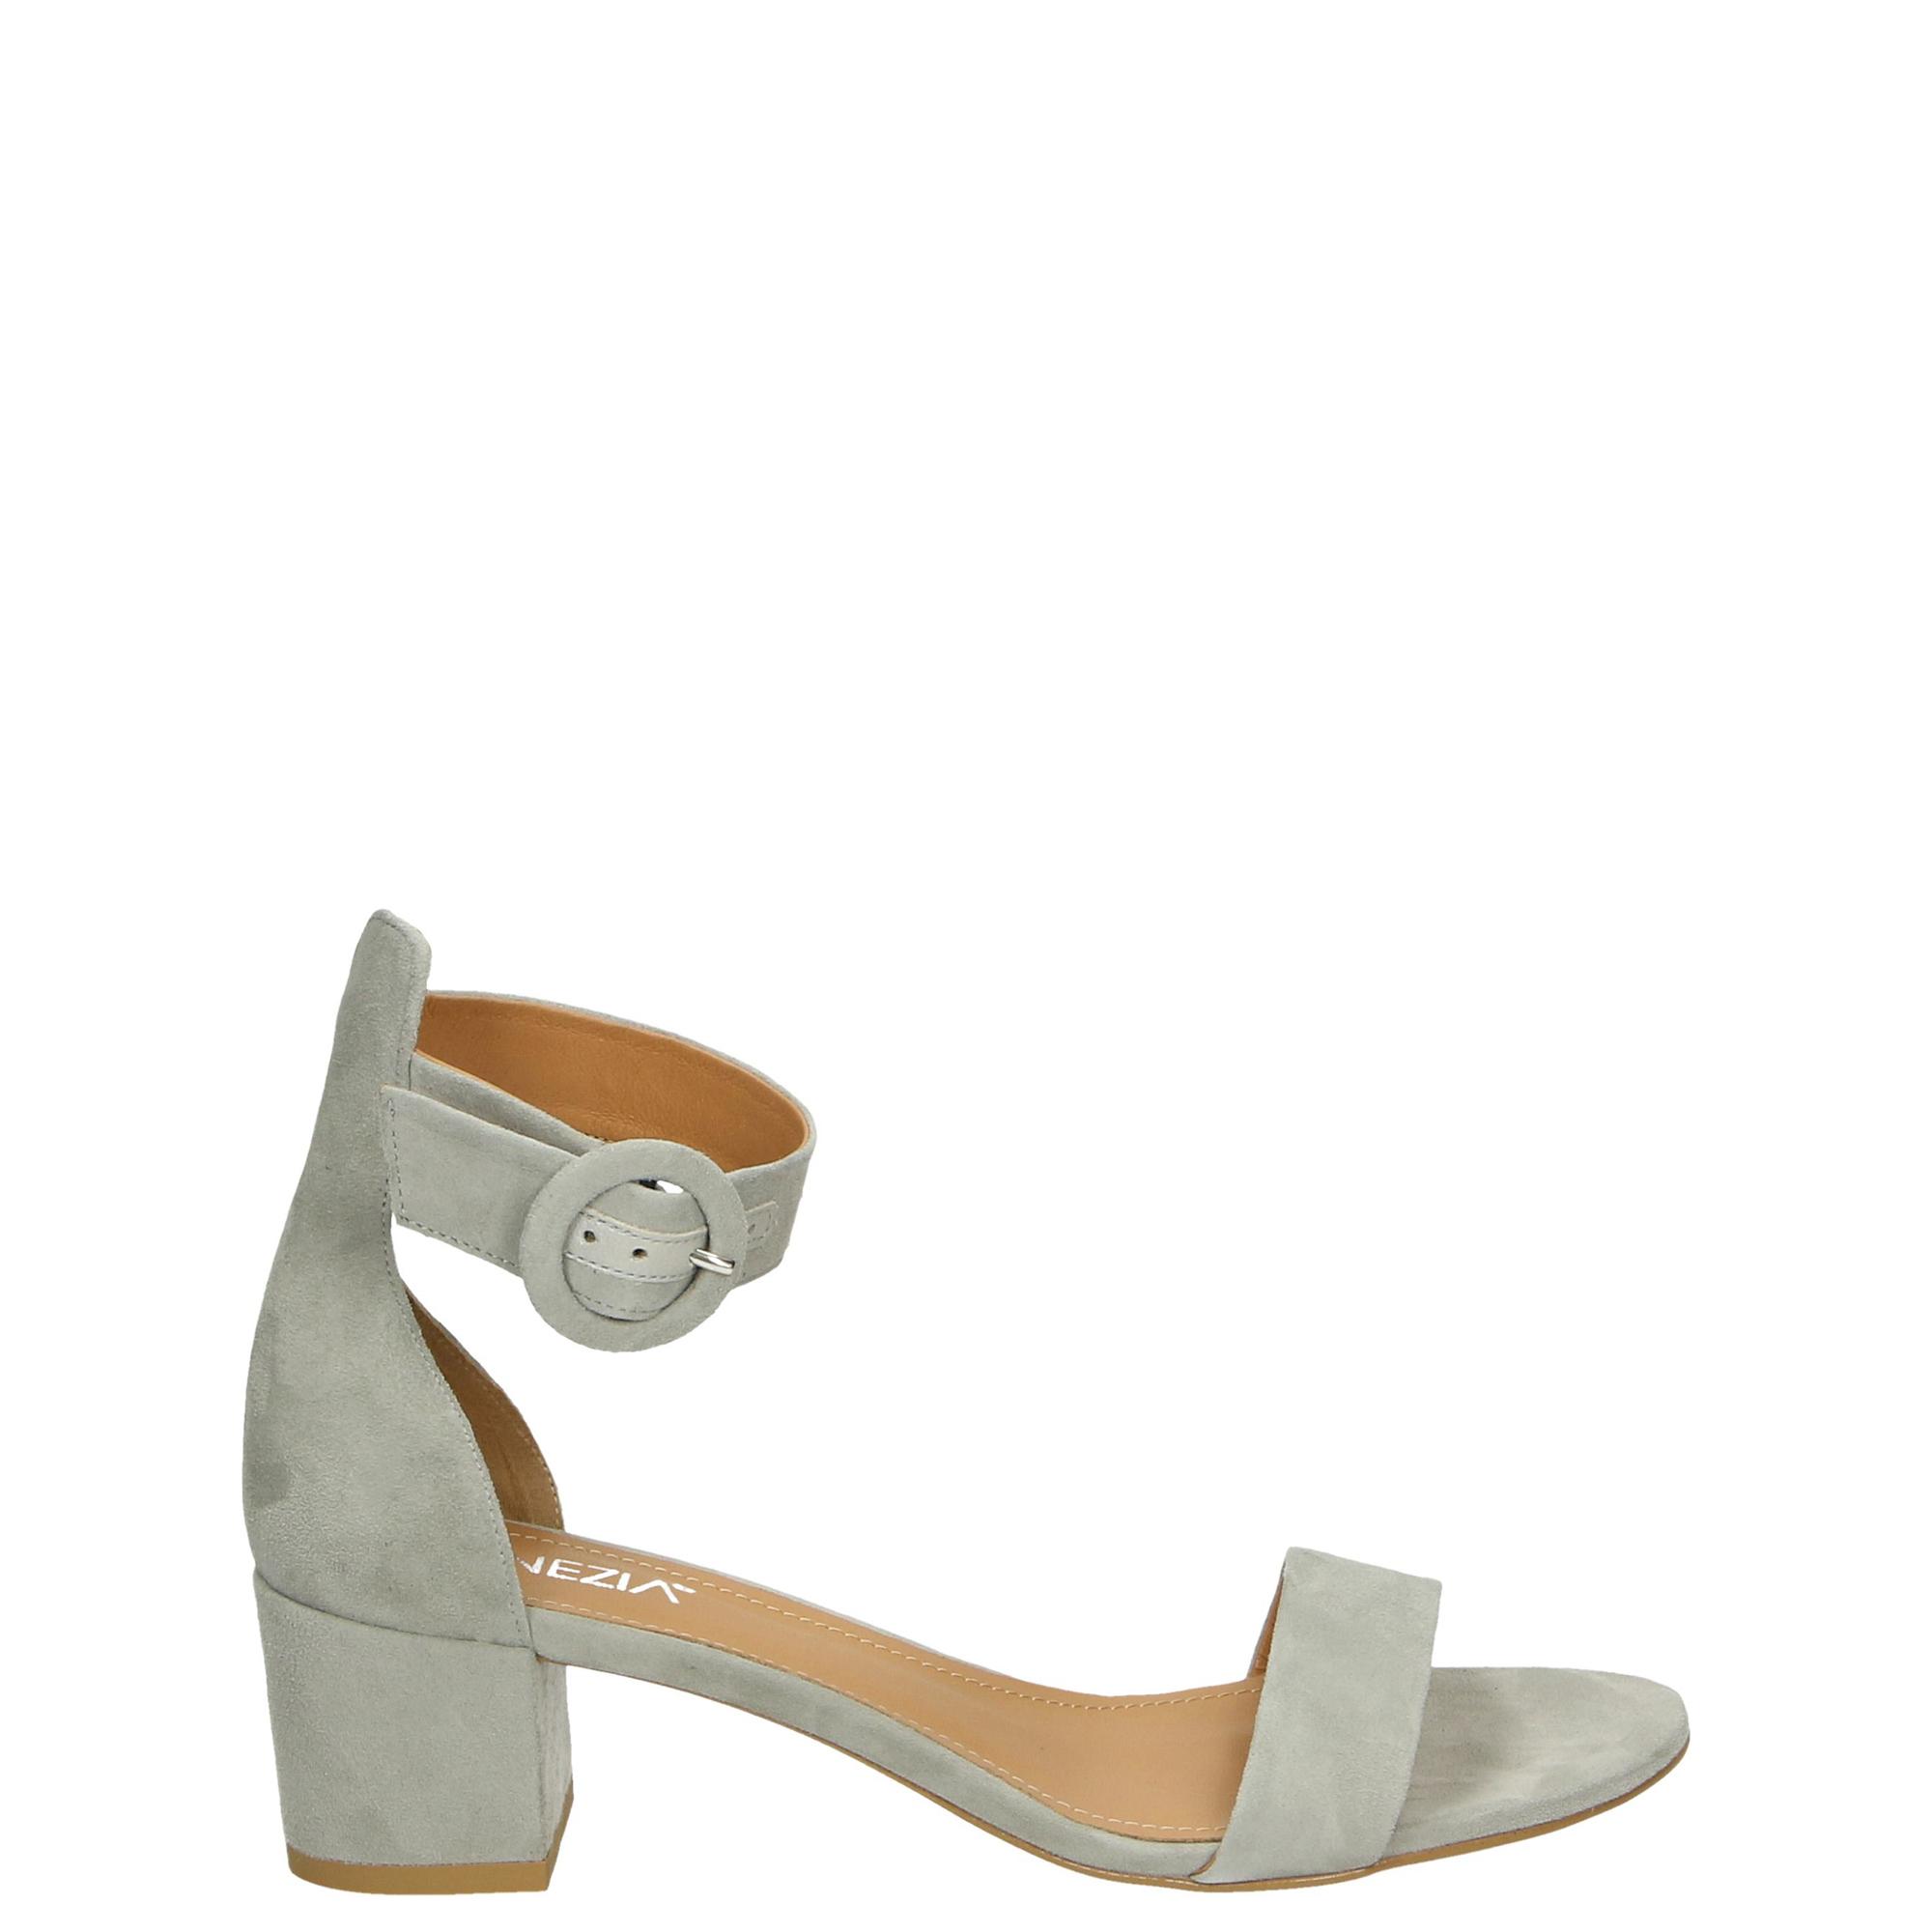 cb9ebd2c9bc6e8 sandały venezia szare sandały zapinane na kostkę - 1713 cam cene - venezia